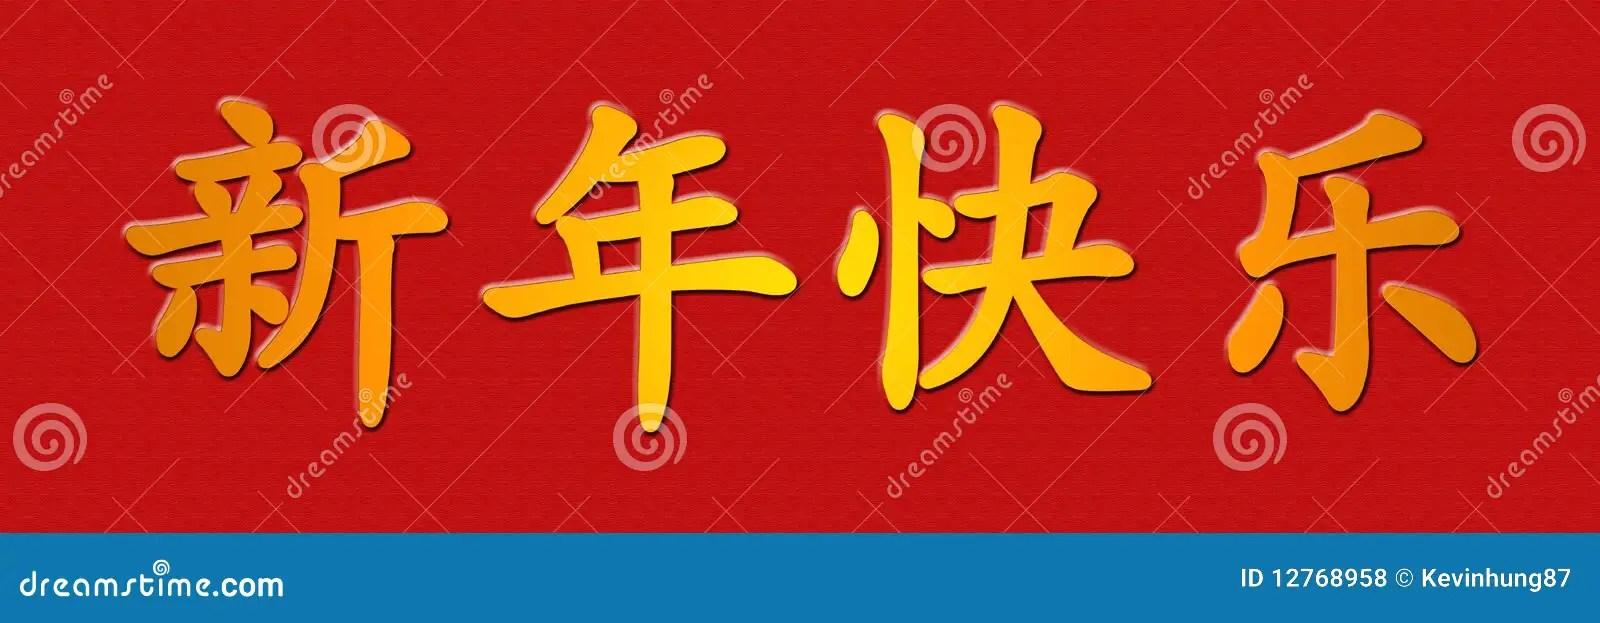 chinese happy new year